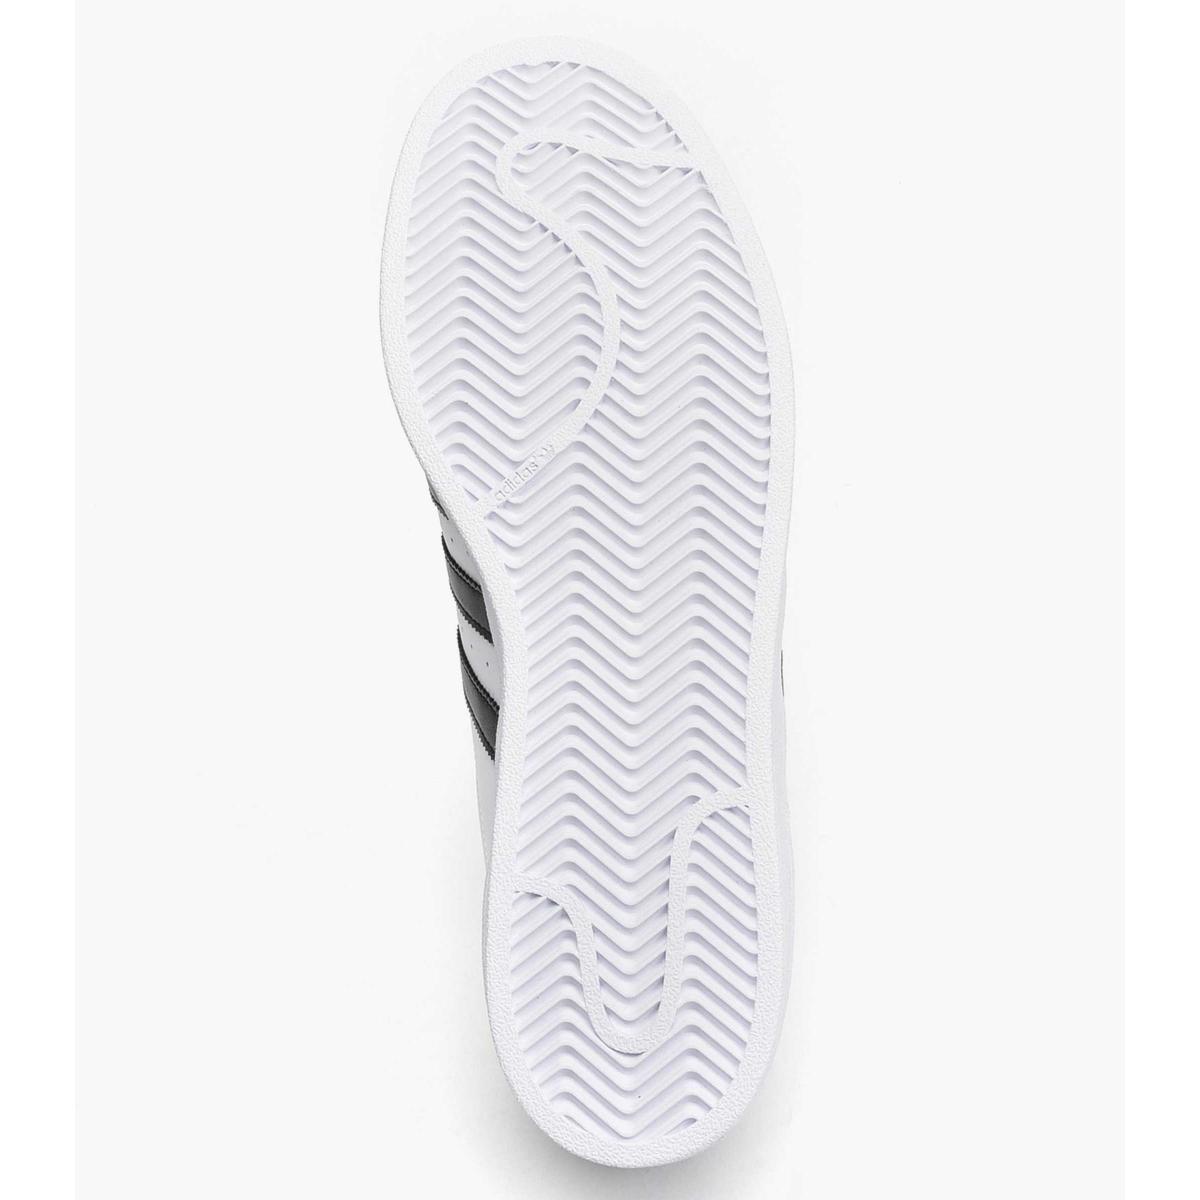 Scarpe Sneakers Adidas SUPERSTAR da uomo rif. C77124